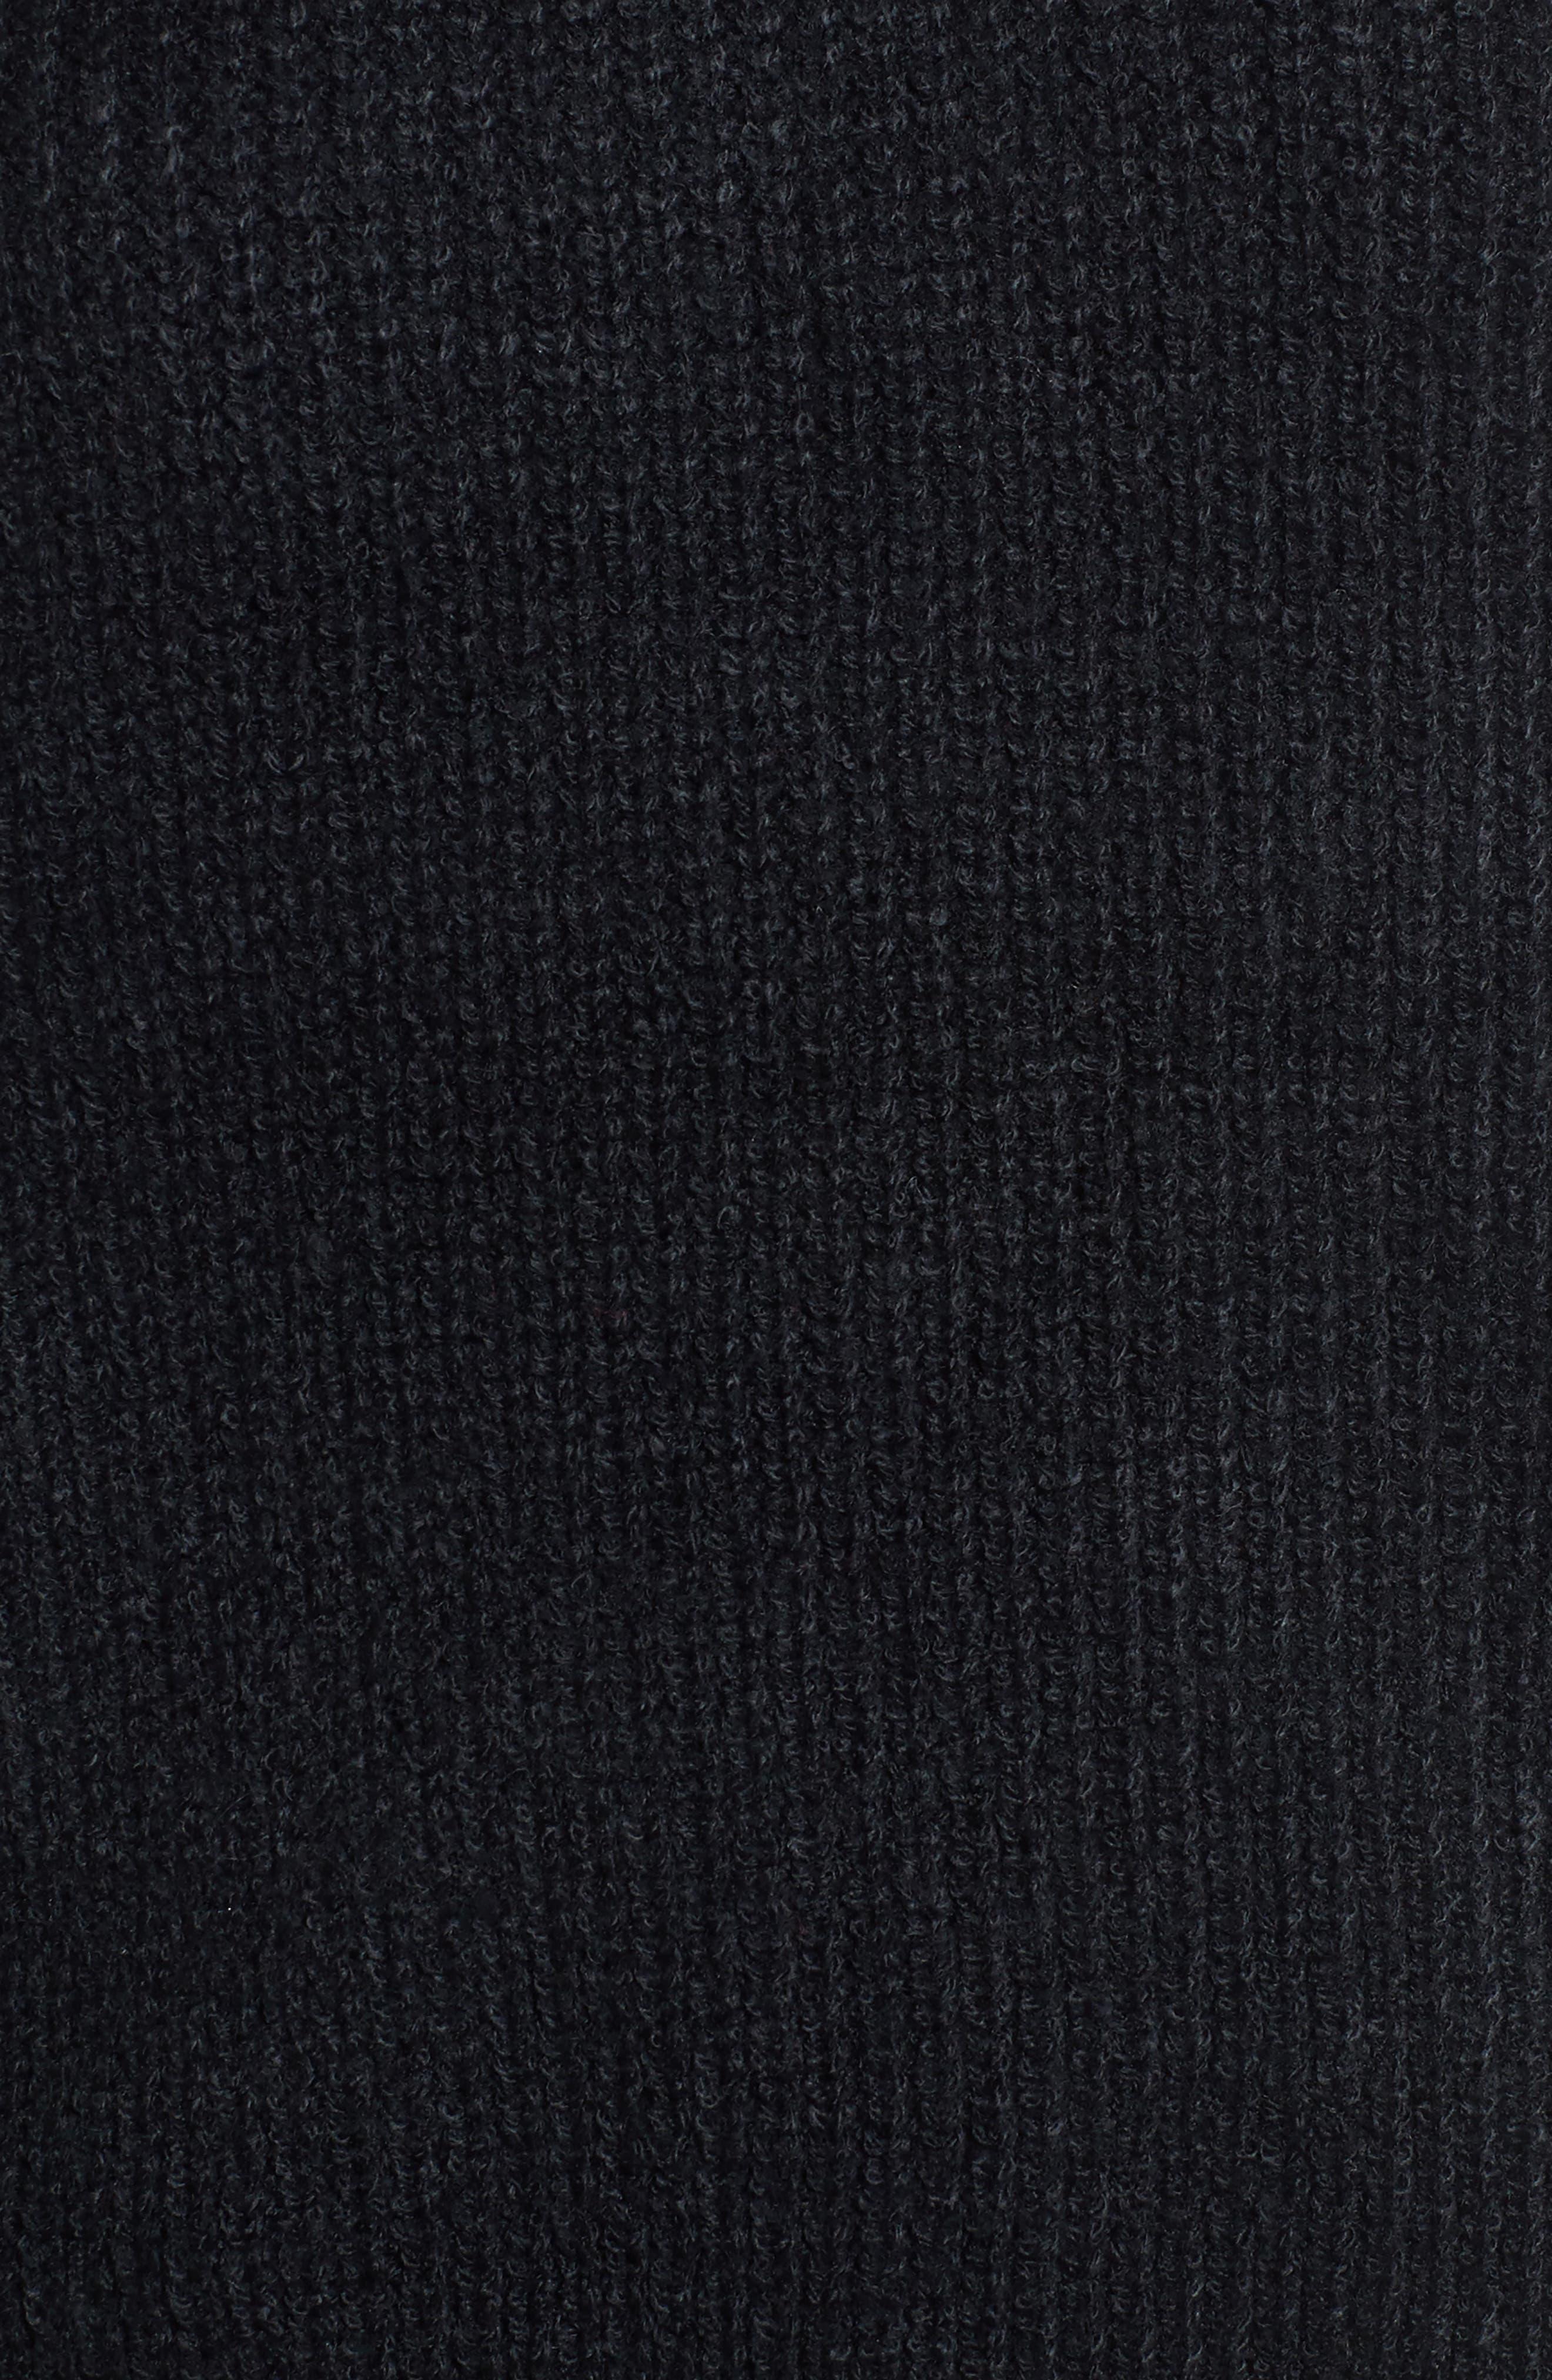 Cutout Turtleneck Sweater,                             Alternate thumbnail 5, color,                             001